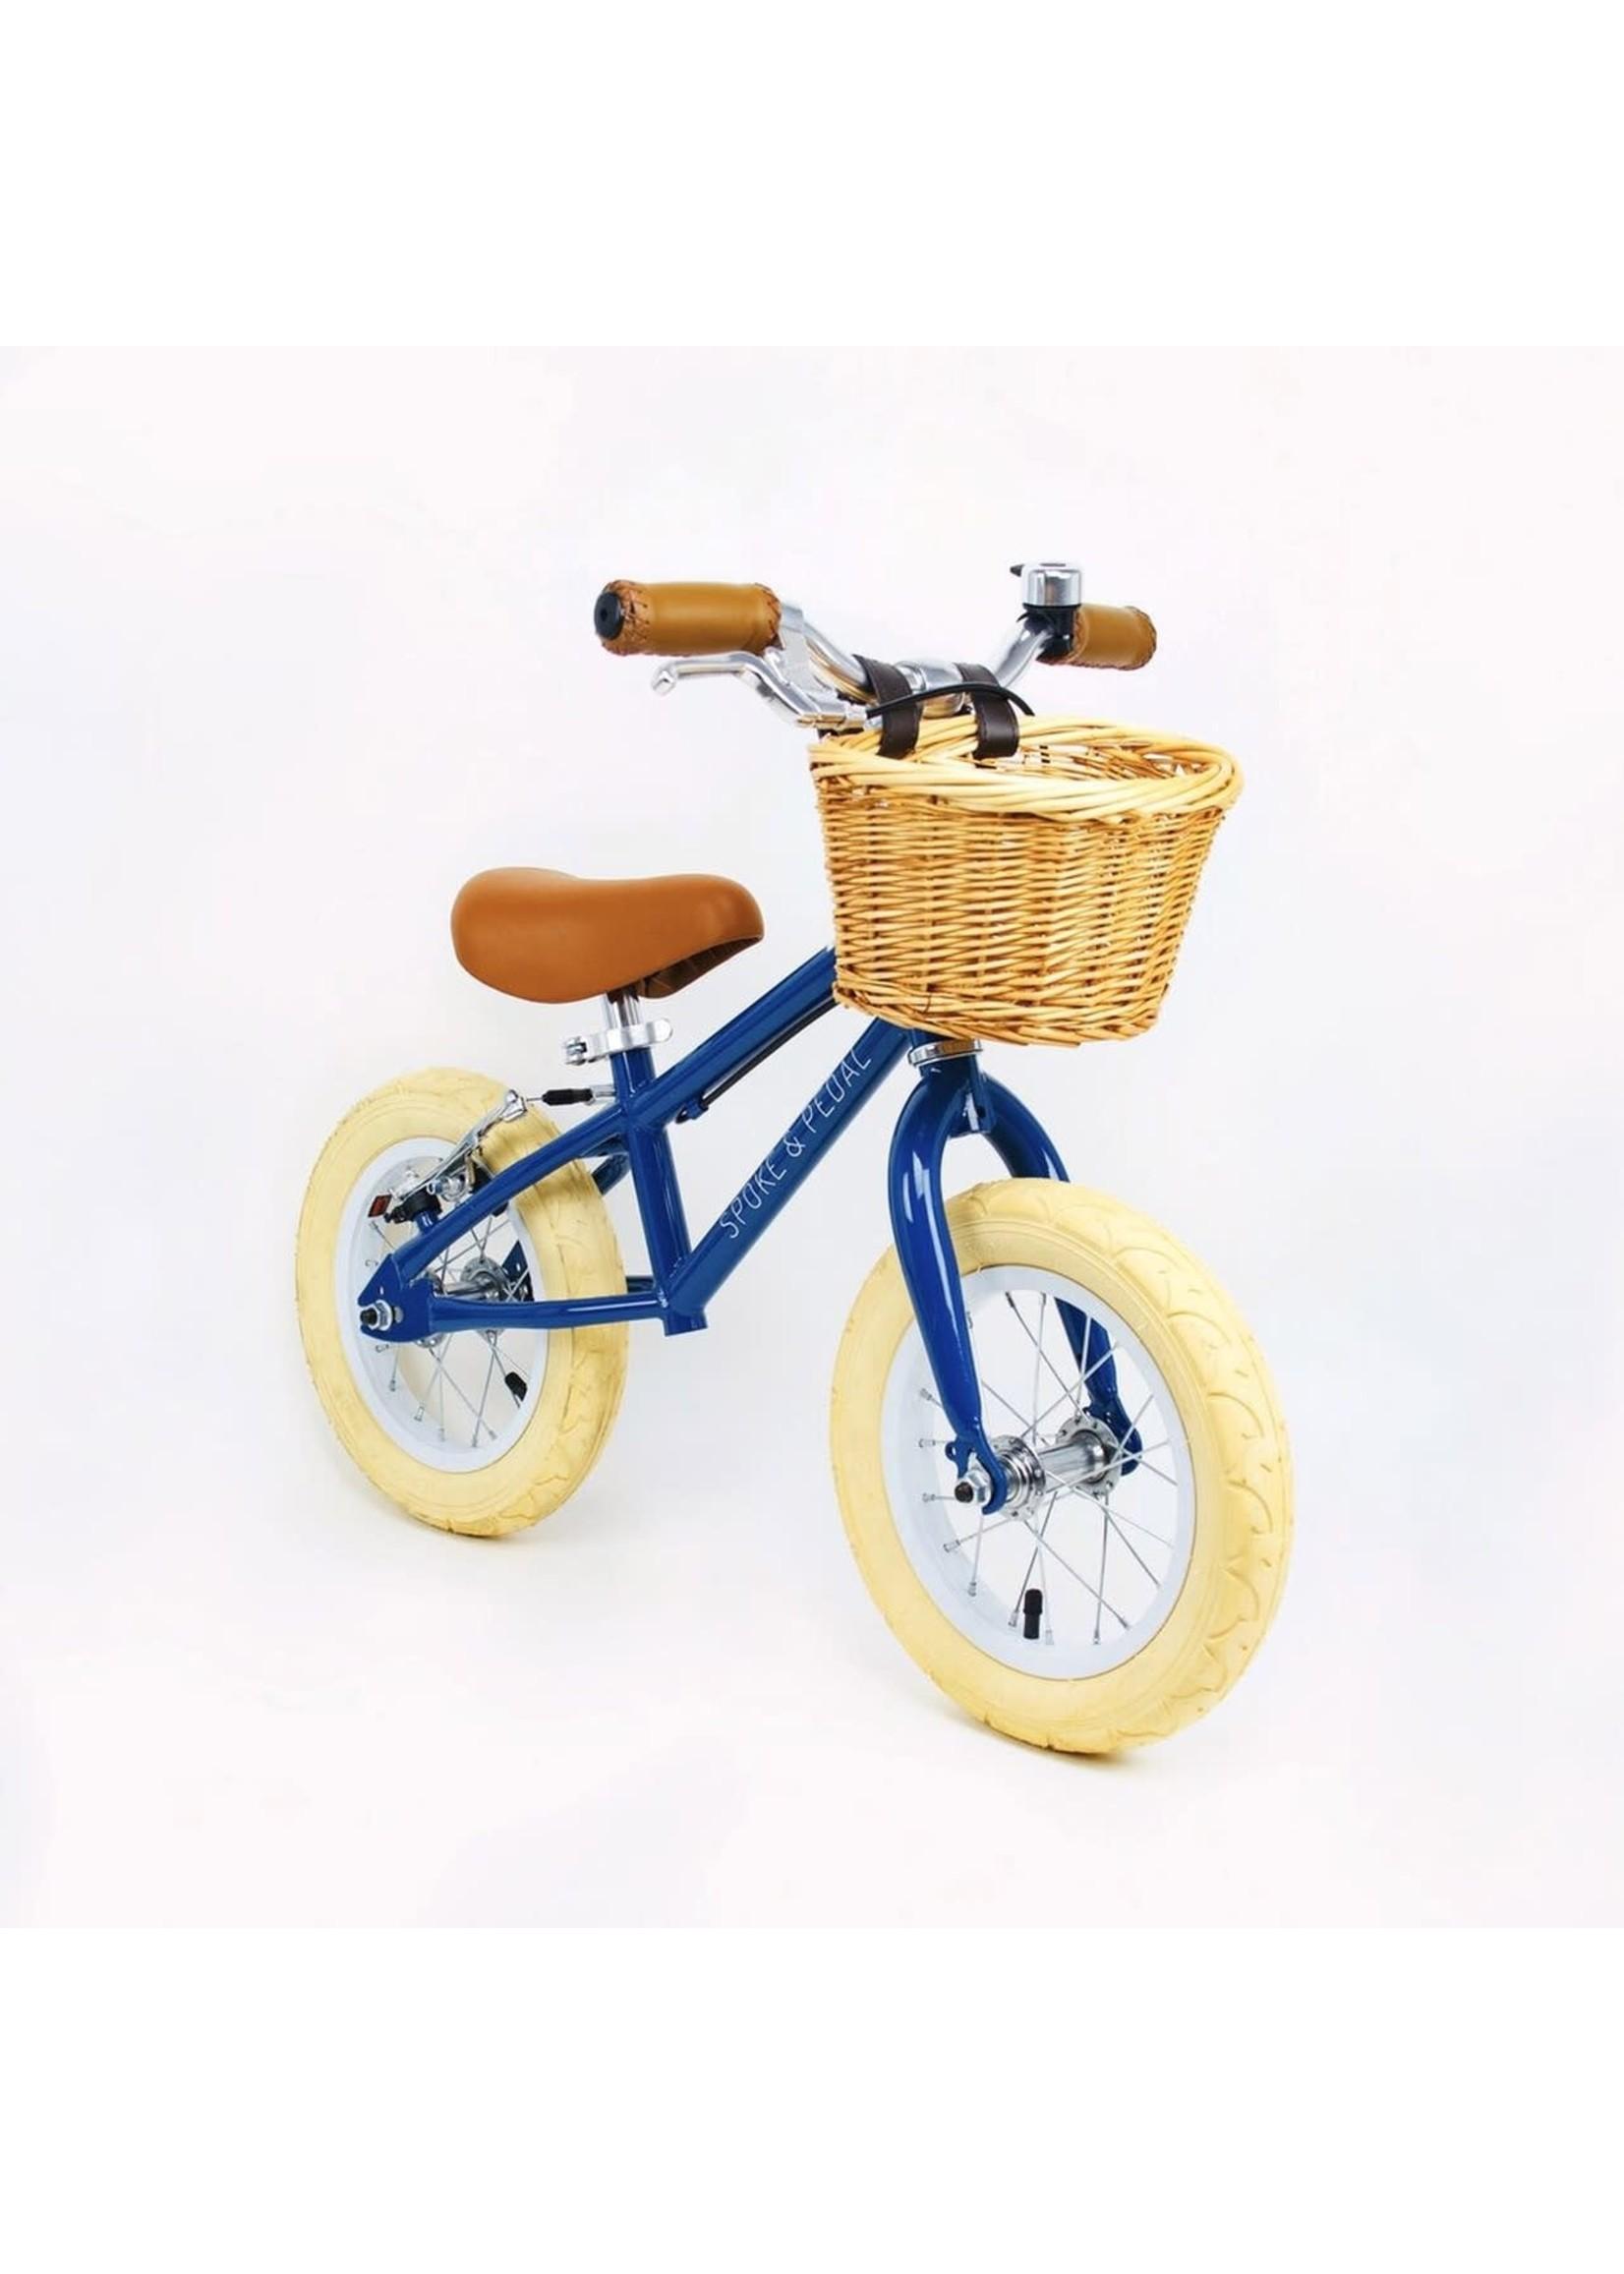 Spoke And Pedal Spoke and Pedal- Original Balance Bike